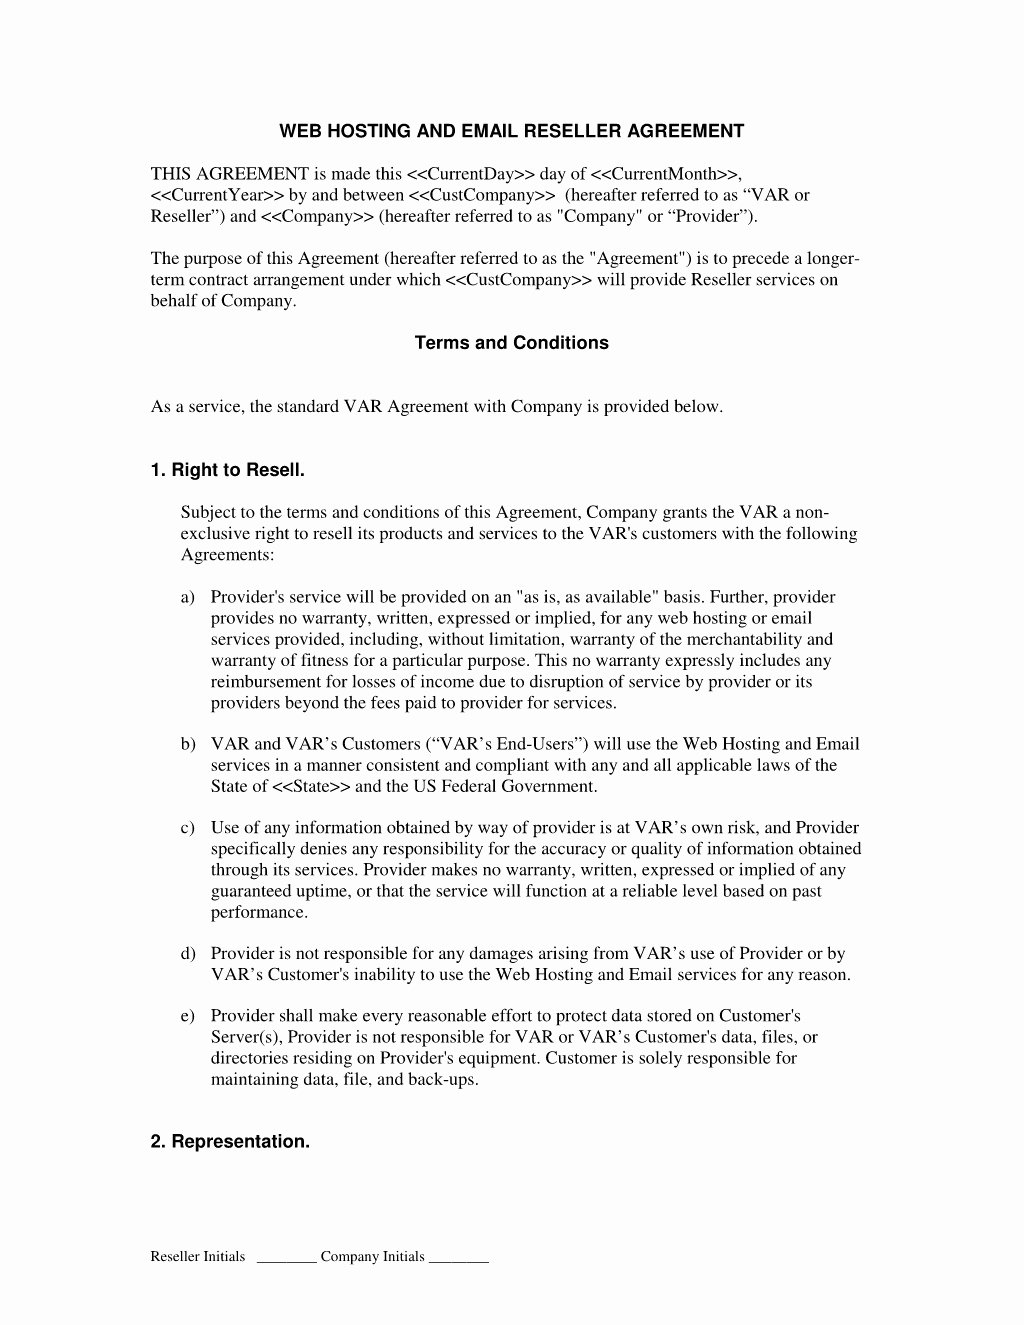 Saas Reseller Agreement Template Best Of Simple Web Hosting Agreement